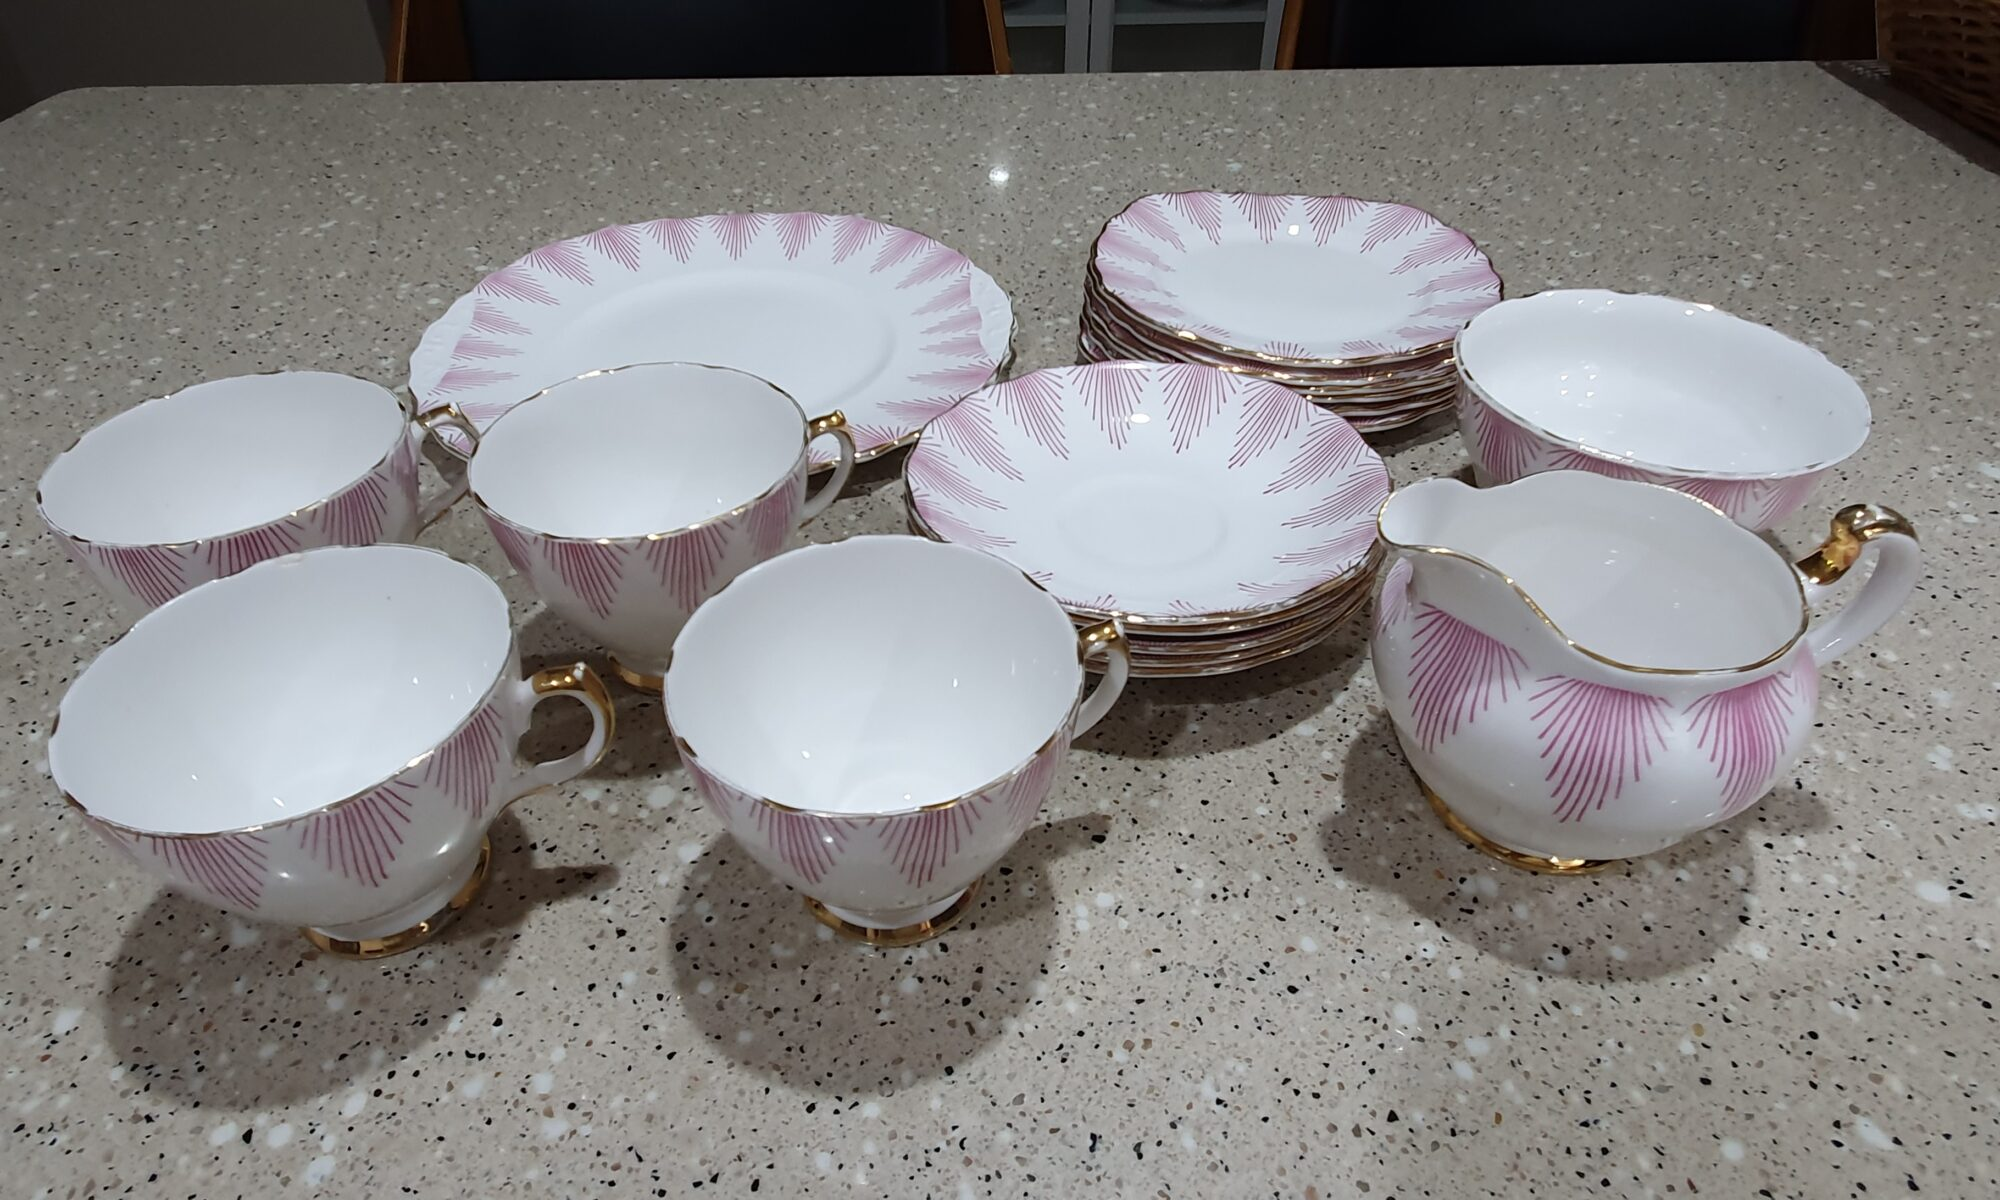 Royal Vale 7654 china tea service